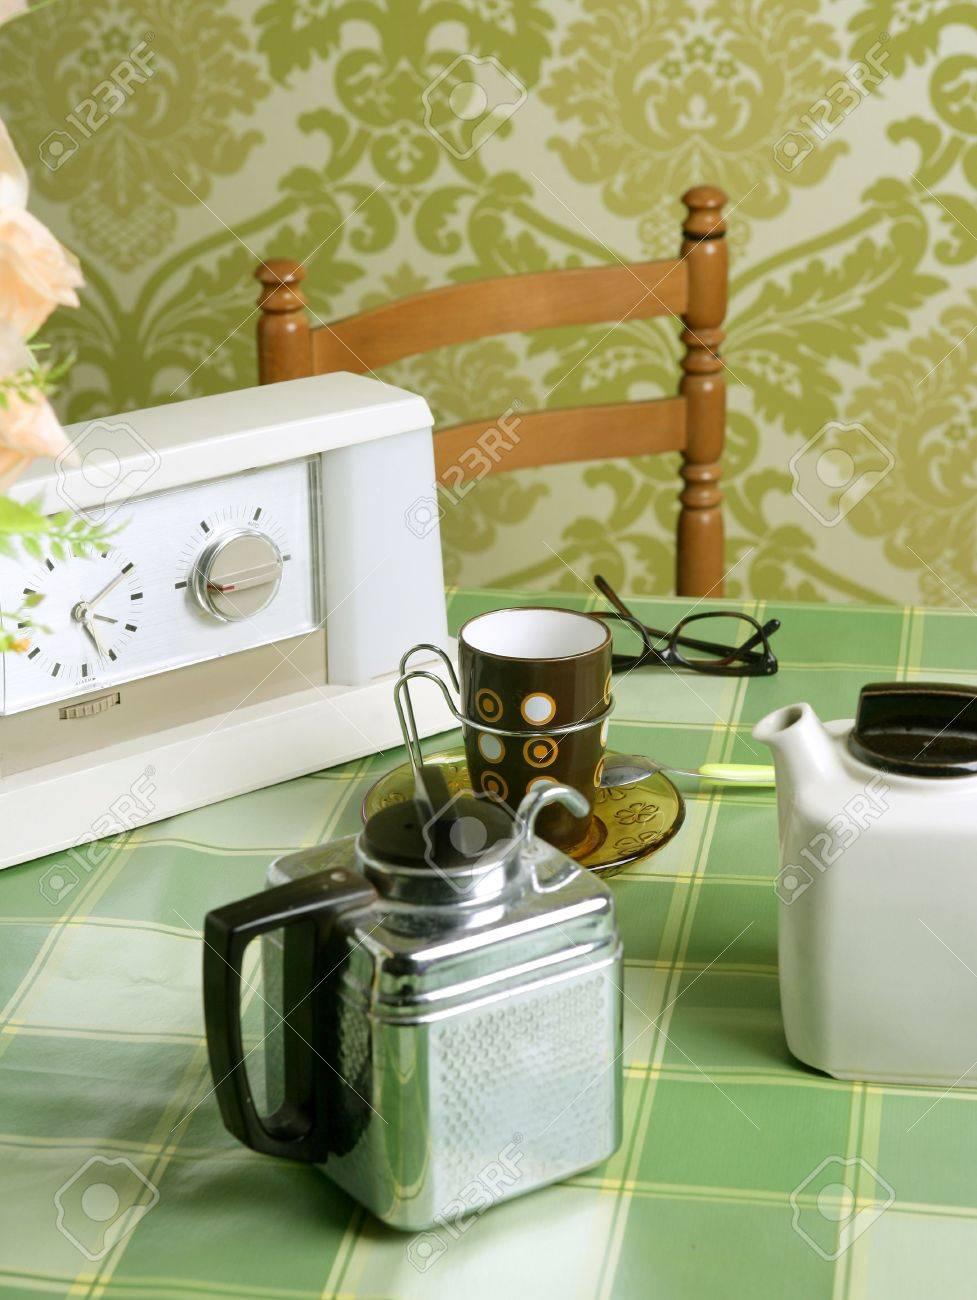 Koffie Machine Retro Keuken Tafel Laken Groene Wall Paper Vintage ...